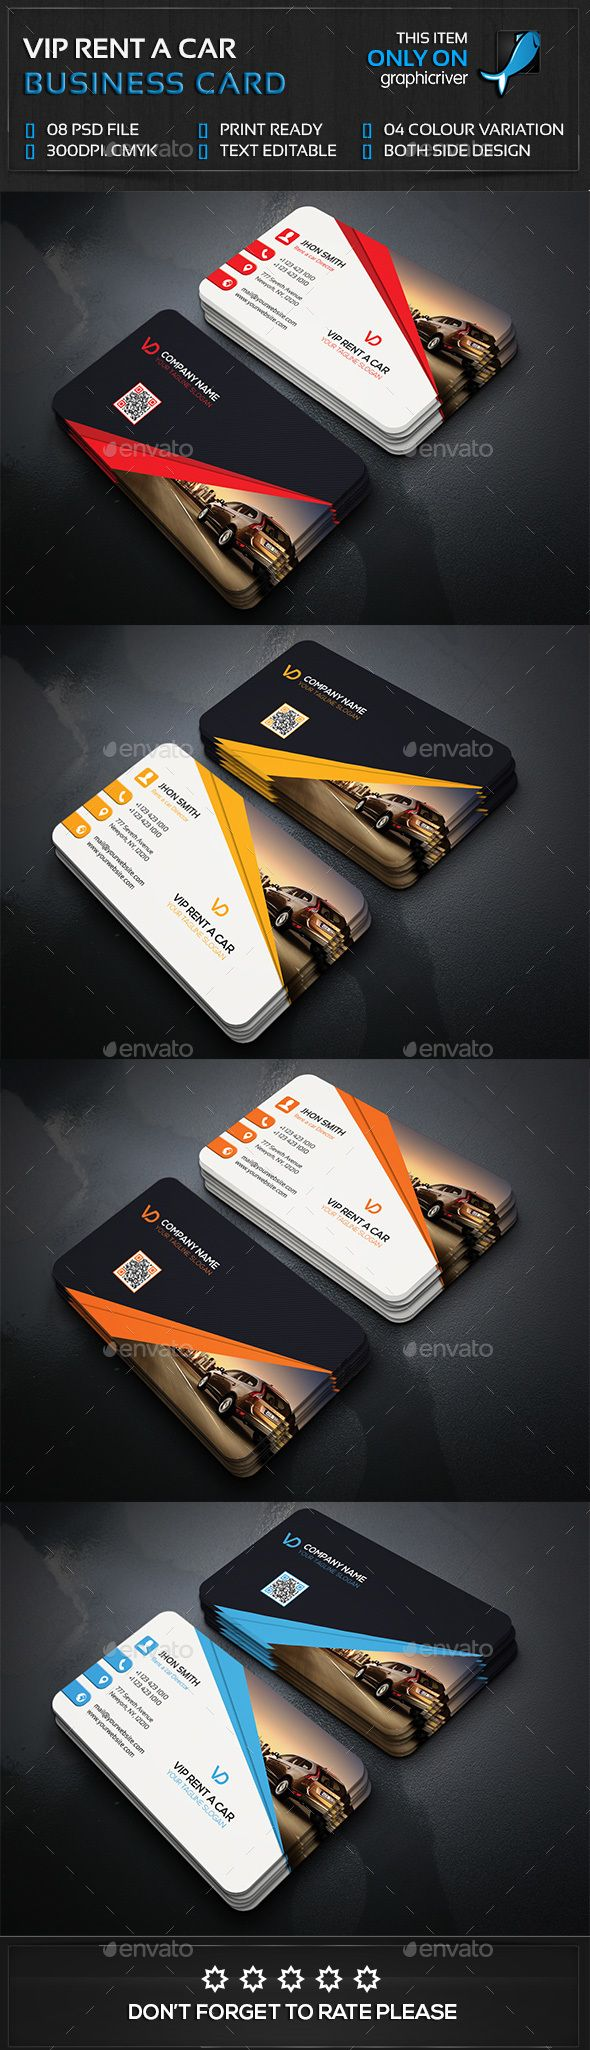 rent a car business card photoshop psd modern high quality